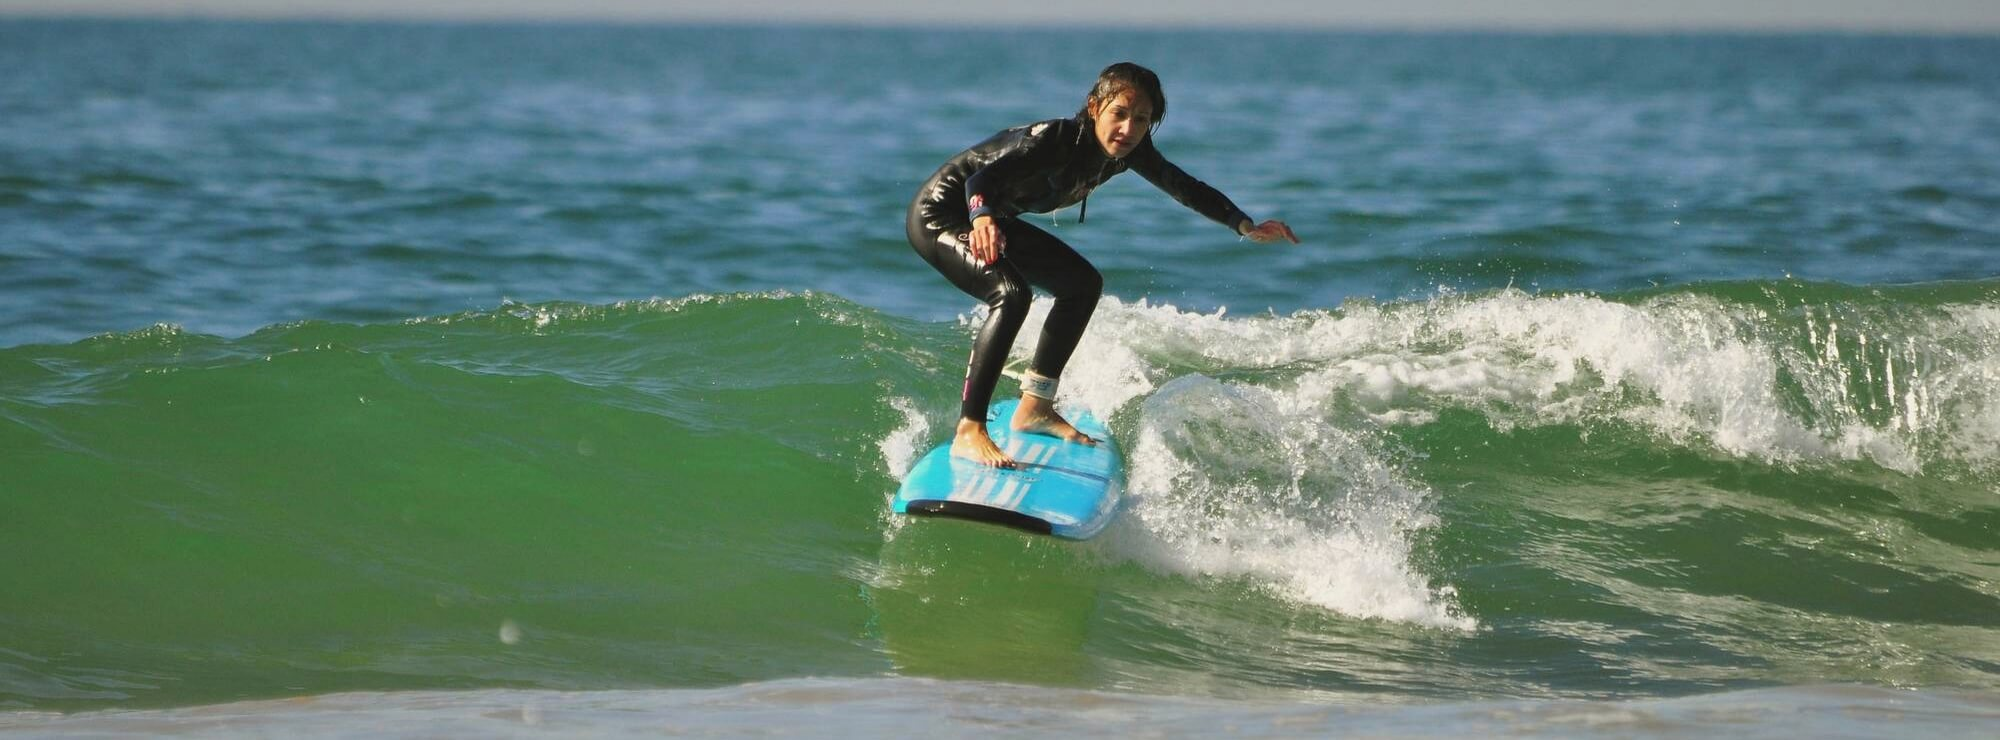 Surfcamp Surf Discovery in tamraght, Souss-Massa-Drâa, Morocco